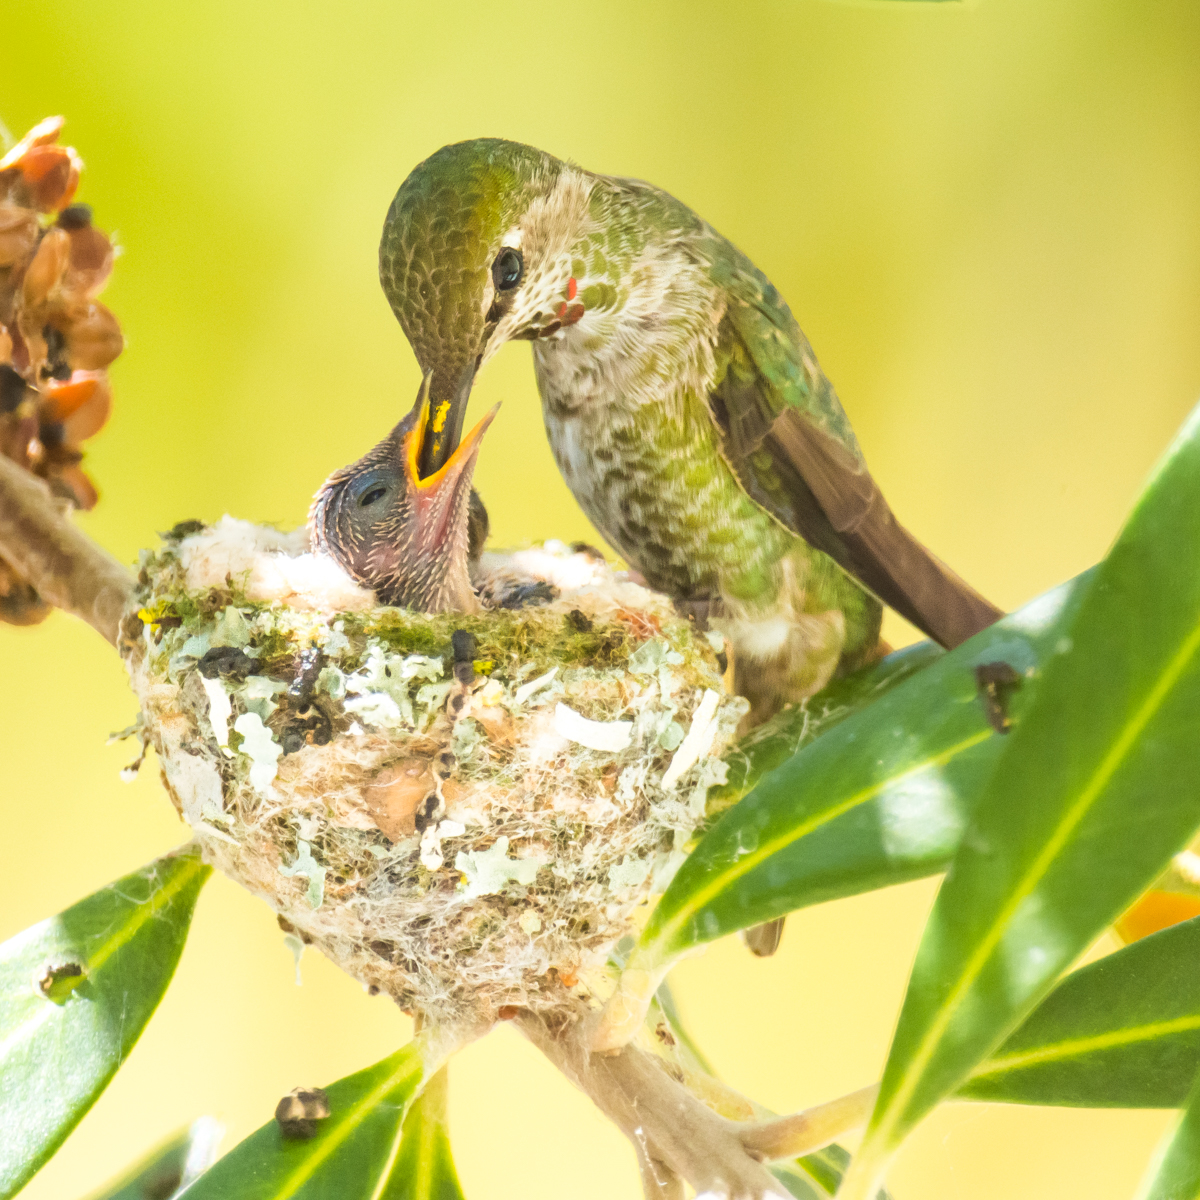 Hummingbirds Benefit From Nesting Near Hawks | THE WILDLIFE SOCIETY